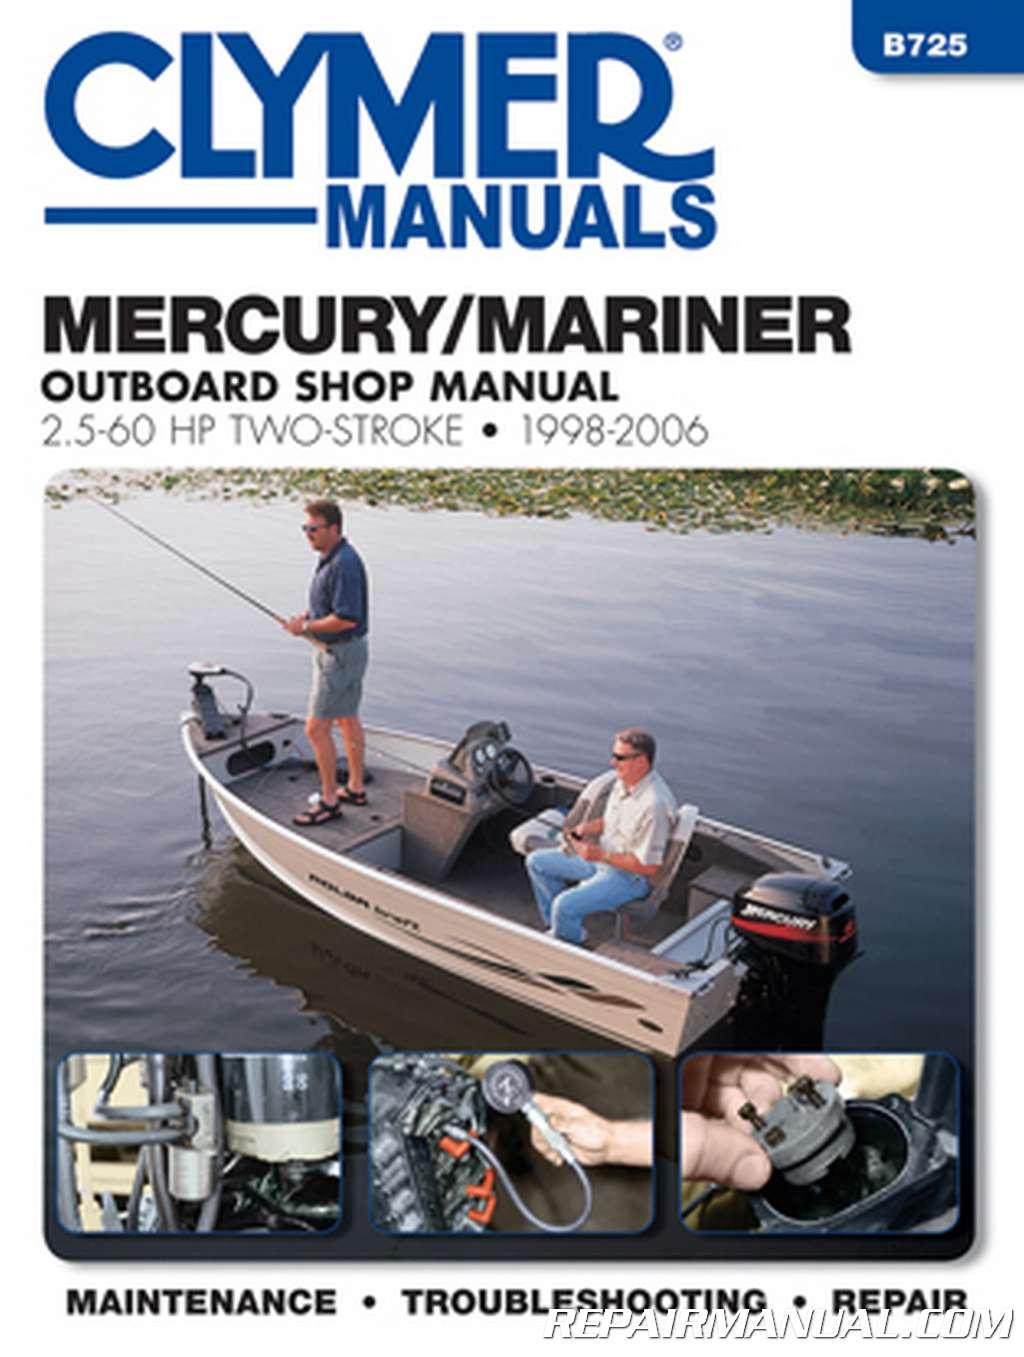 1998 2006 mercury mariner 25hp 60hp outboard boat engine for Boat motor repair shops